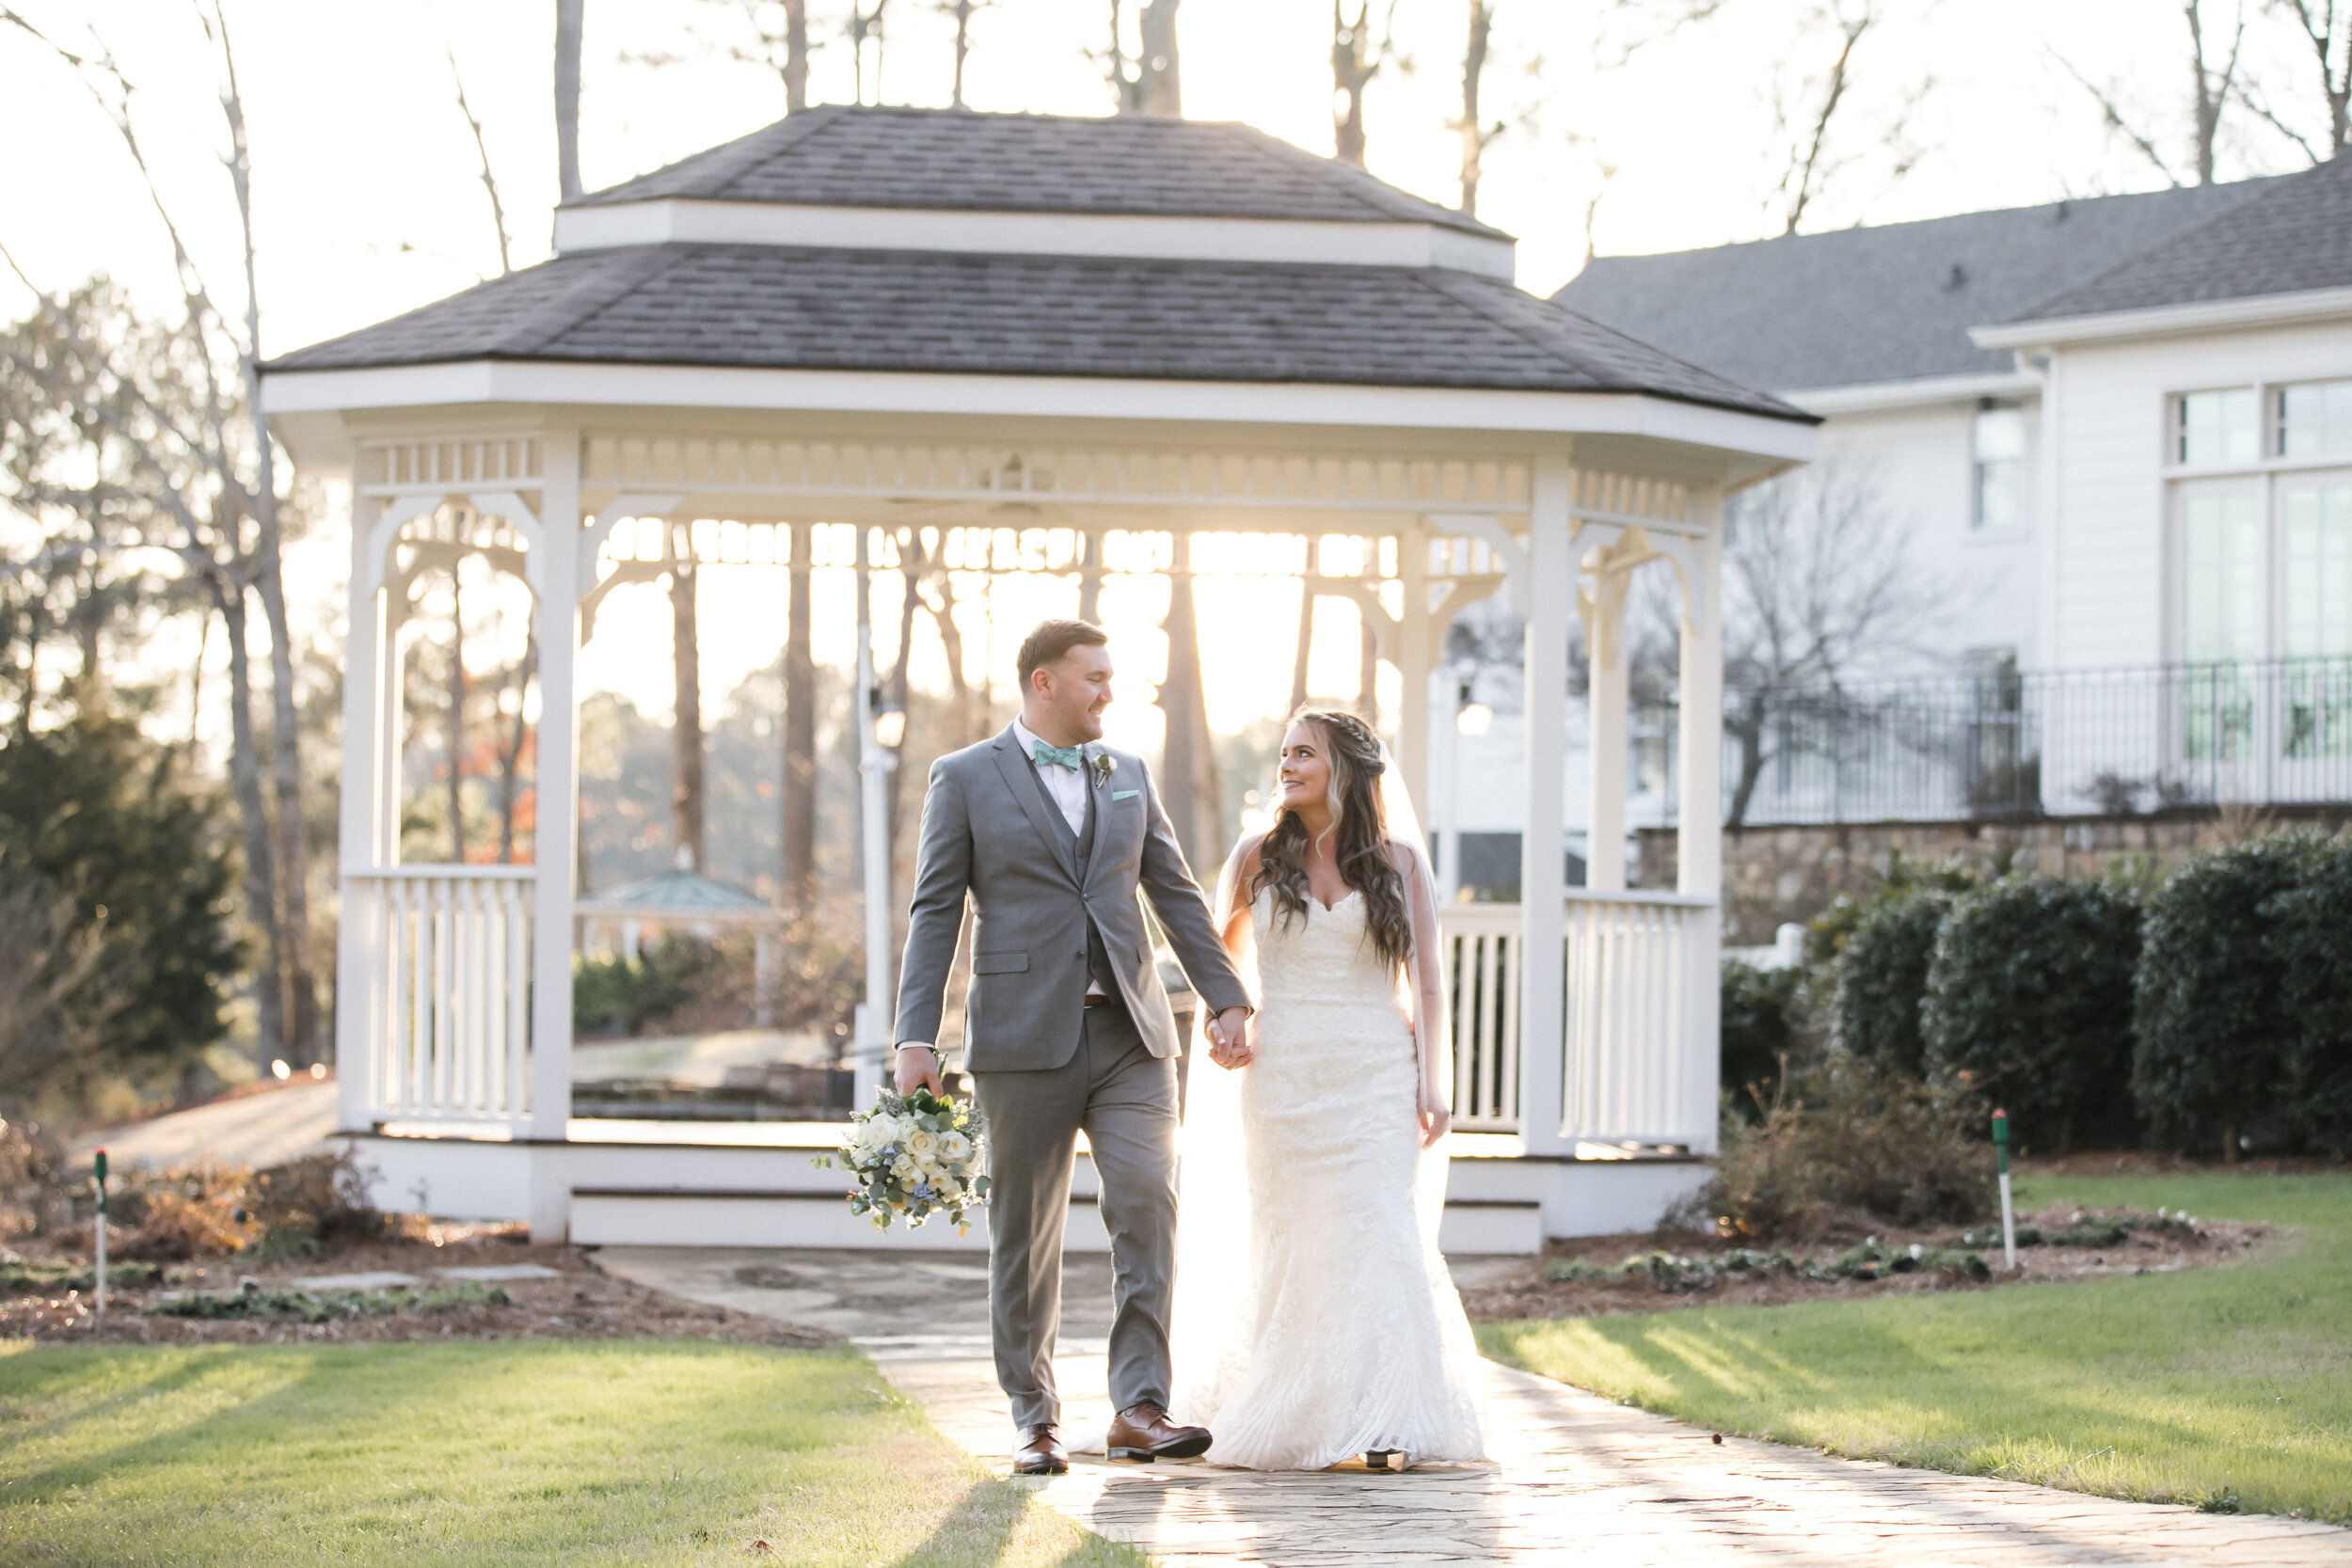 Wedding Bliss at Little River Farms in Alpharetta, GA   Photo by Jessica Williams Studio